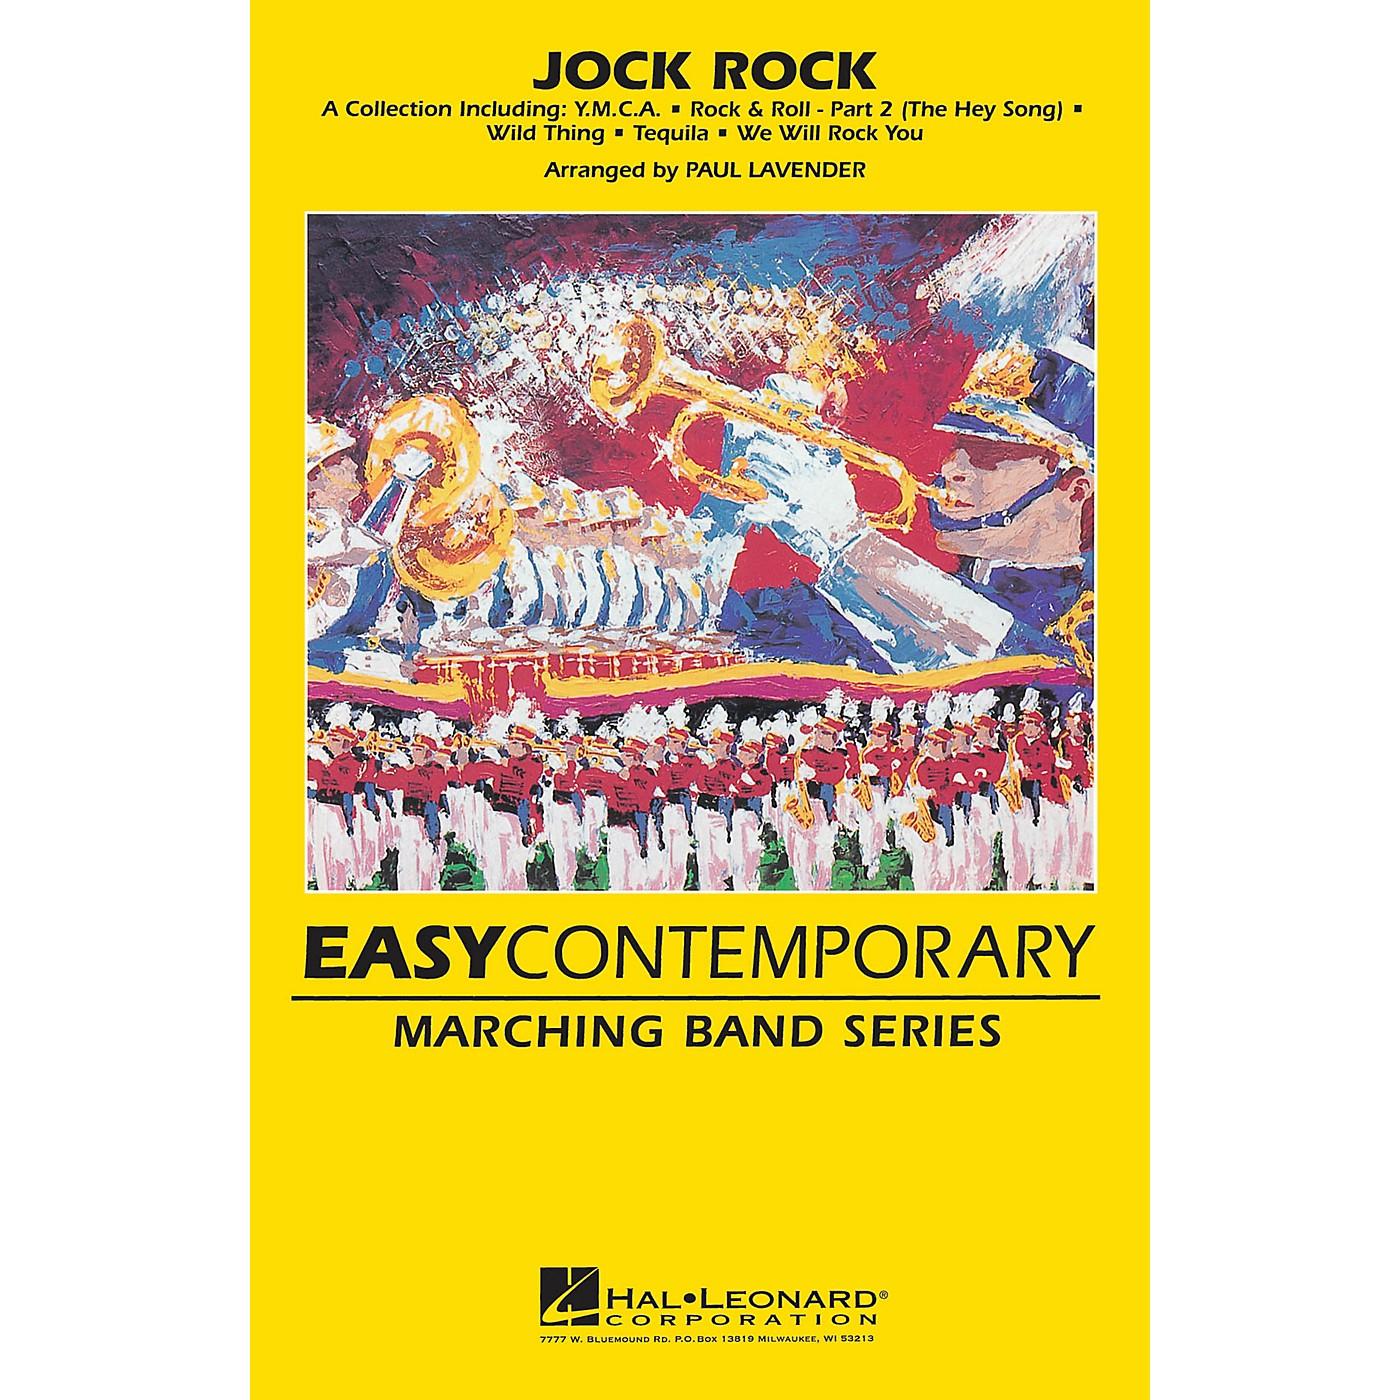 Hal Leonard Jock Rock Marching Band Level 2 Arranged by Paul Lavender thumbnail